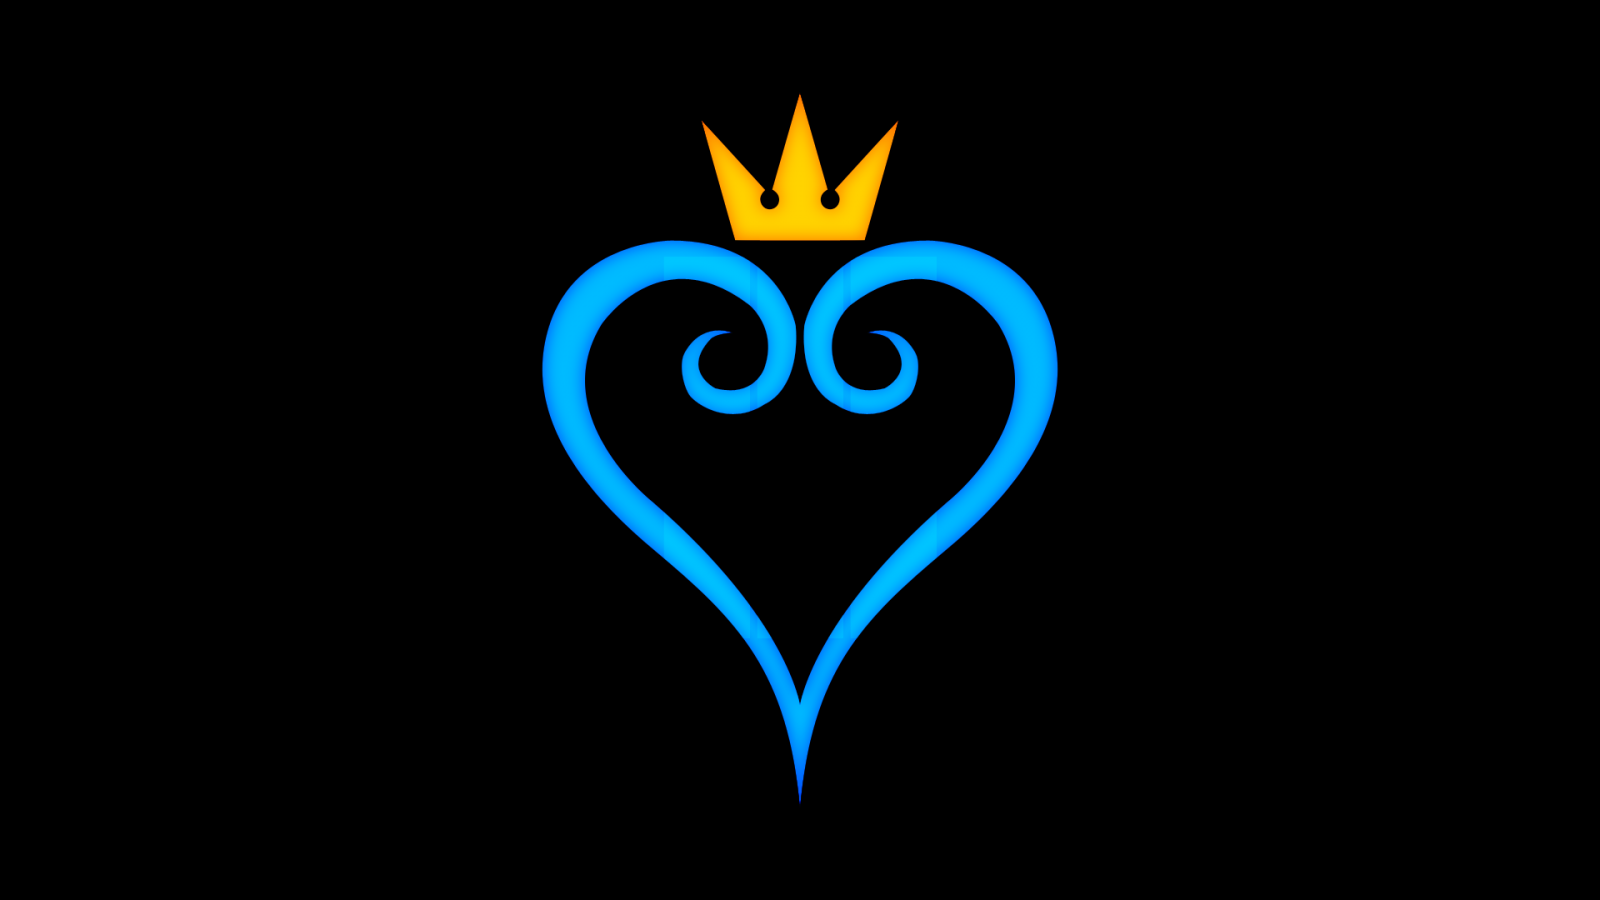 Download Kingdom Hearts Heart Black Logo Crown Disney Wallpaper Download 1600x900 Games Othe Kingdom Hearts Wallpaper Kingdom Hearts Logo Kingdom Hearts Tattoo